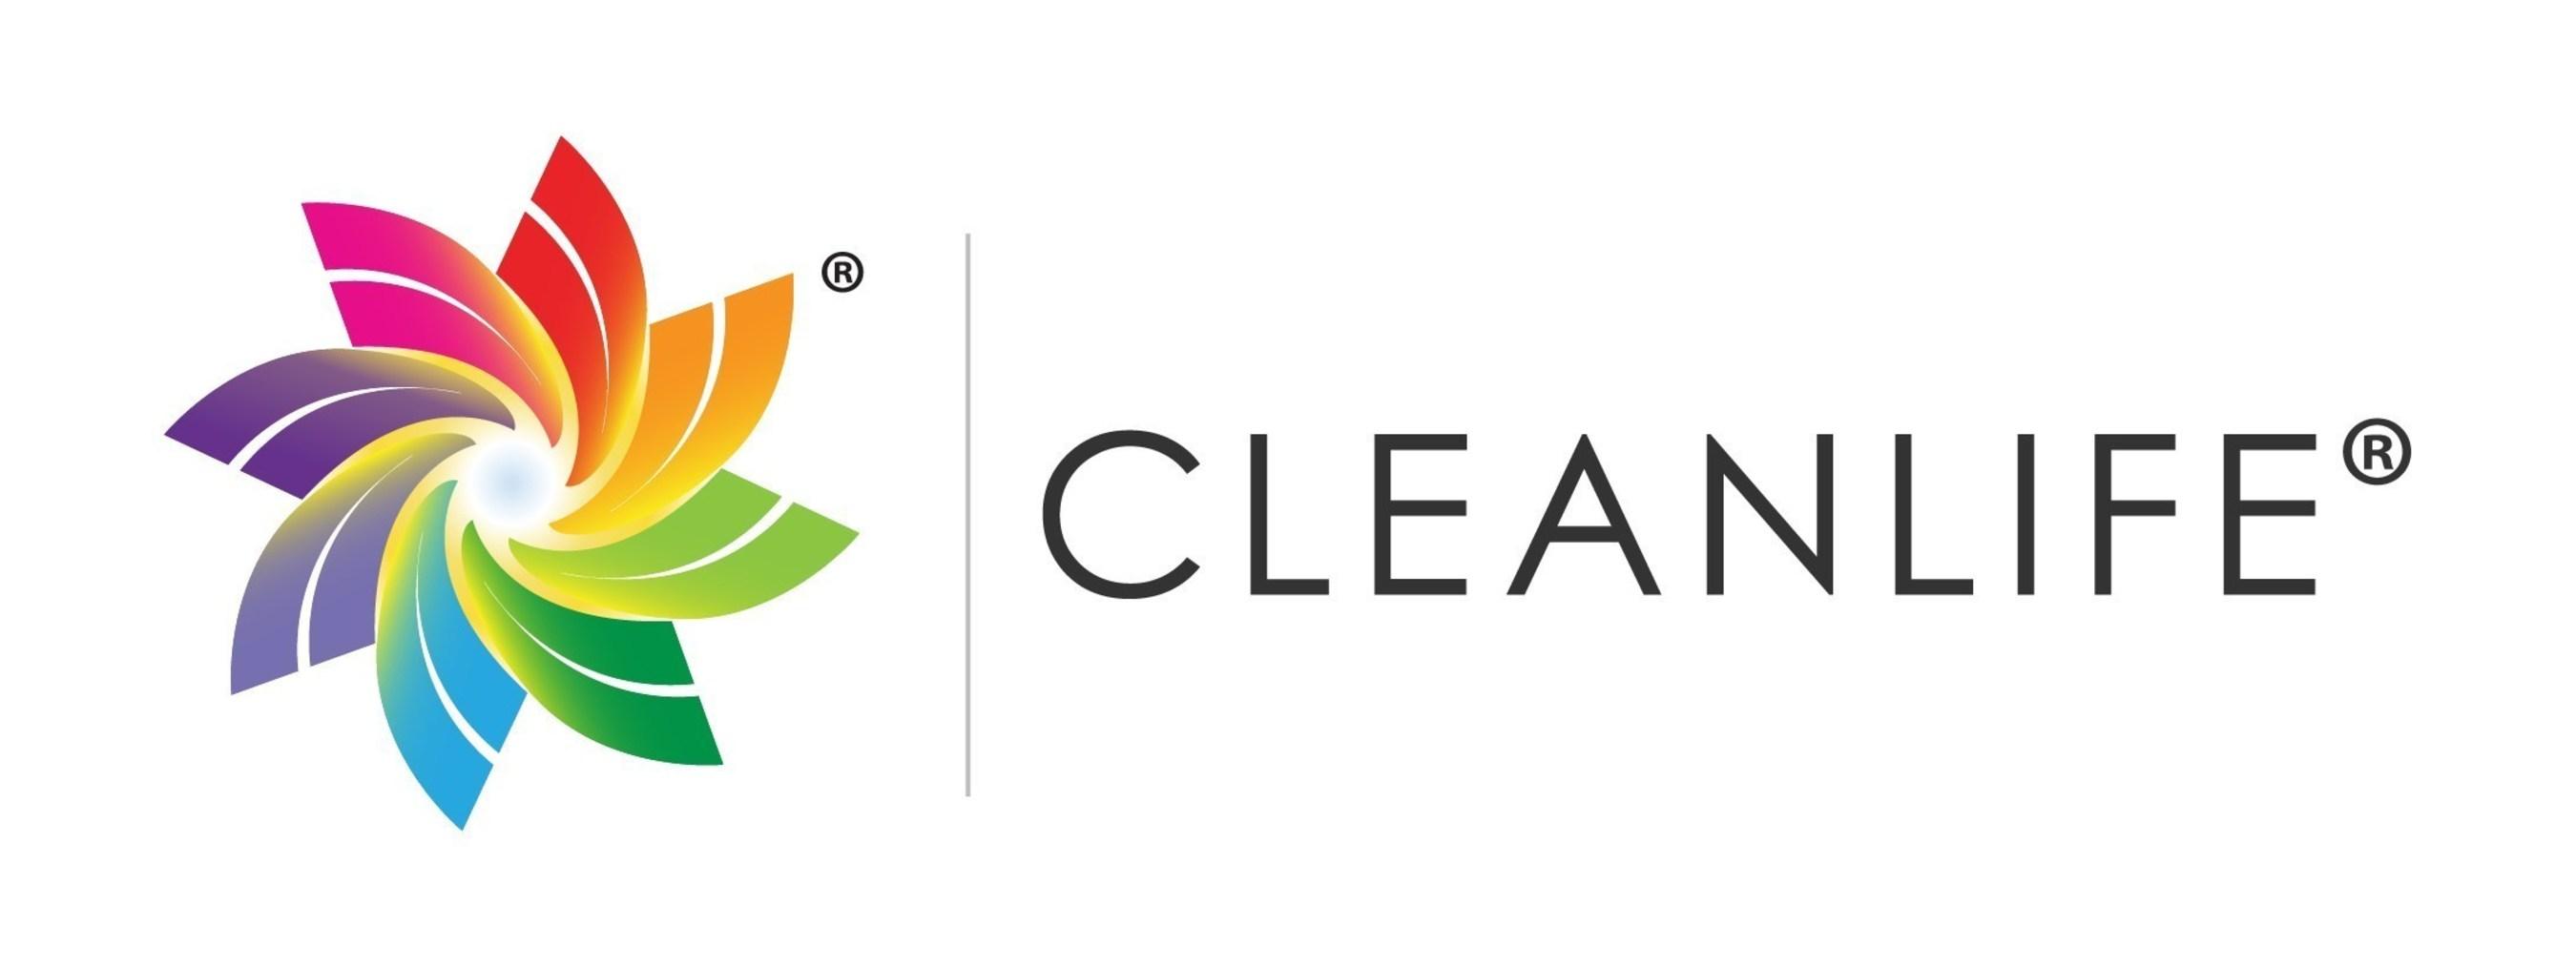 CLEANLIFE(R) ENERGY